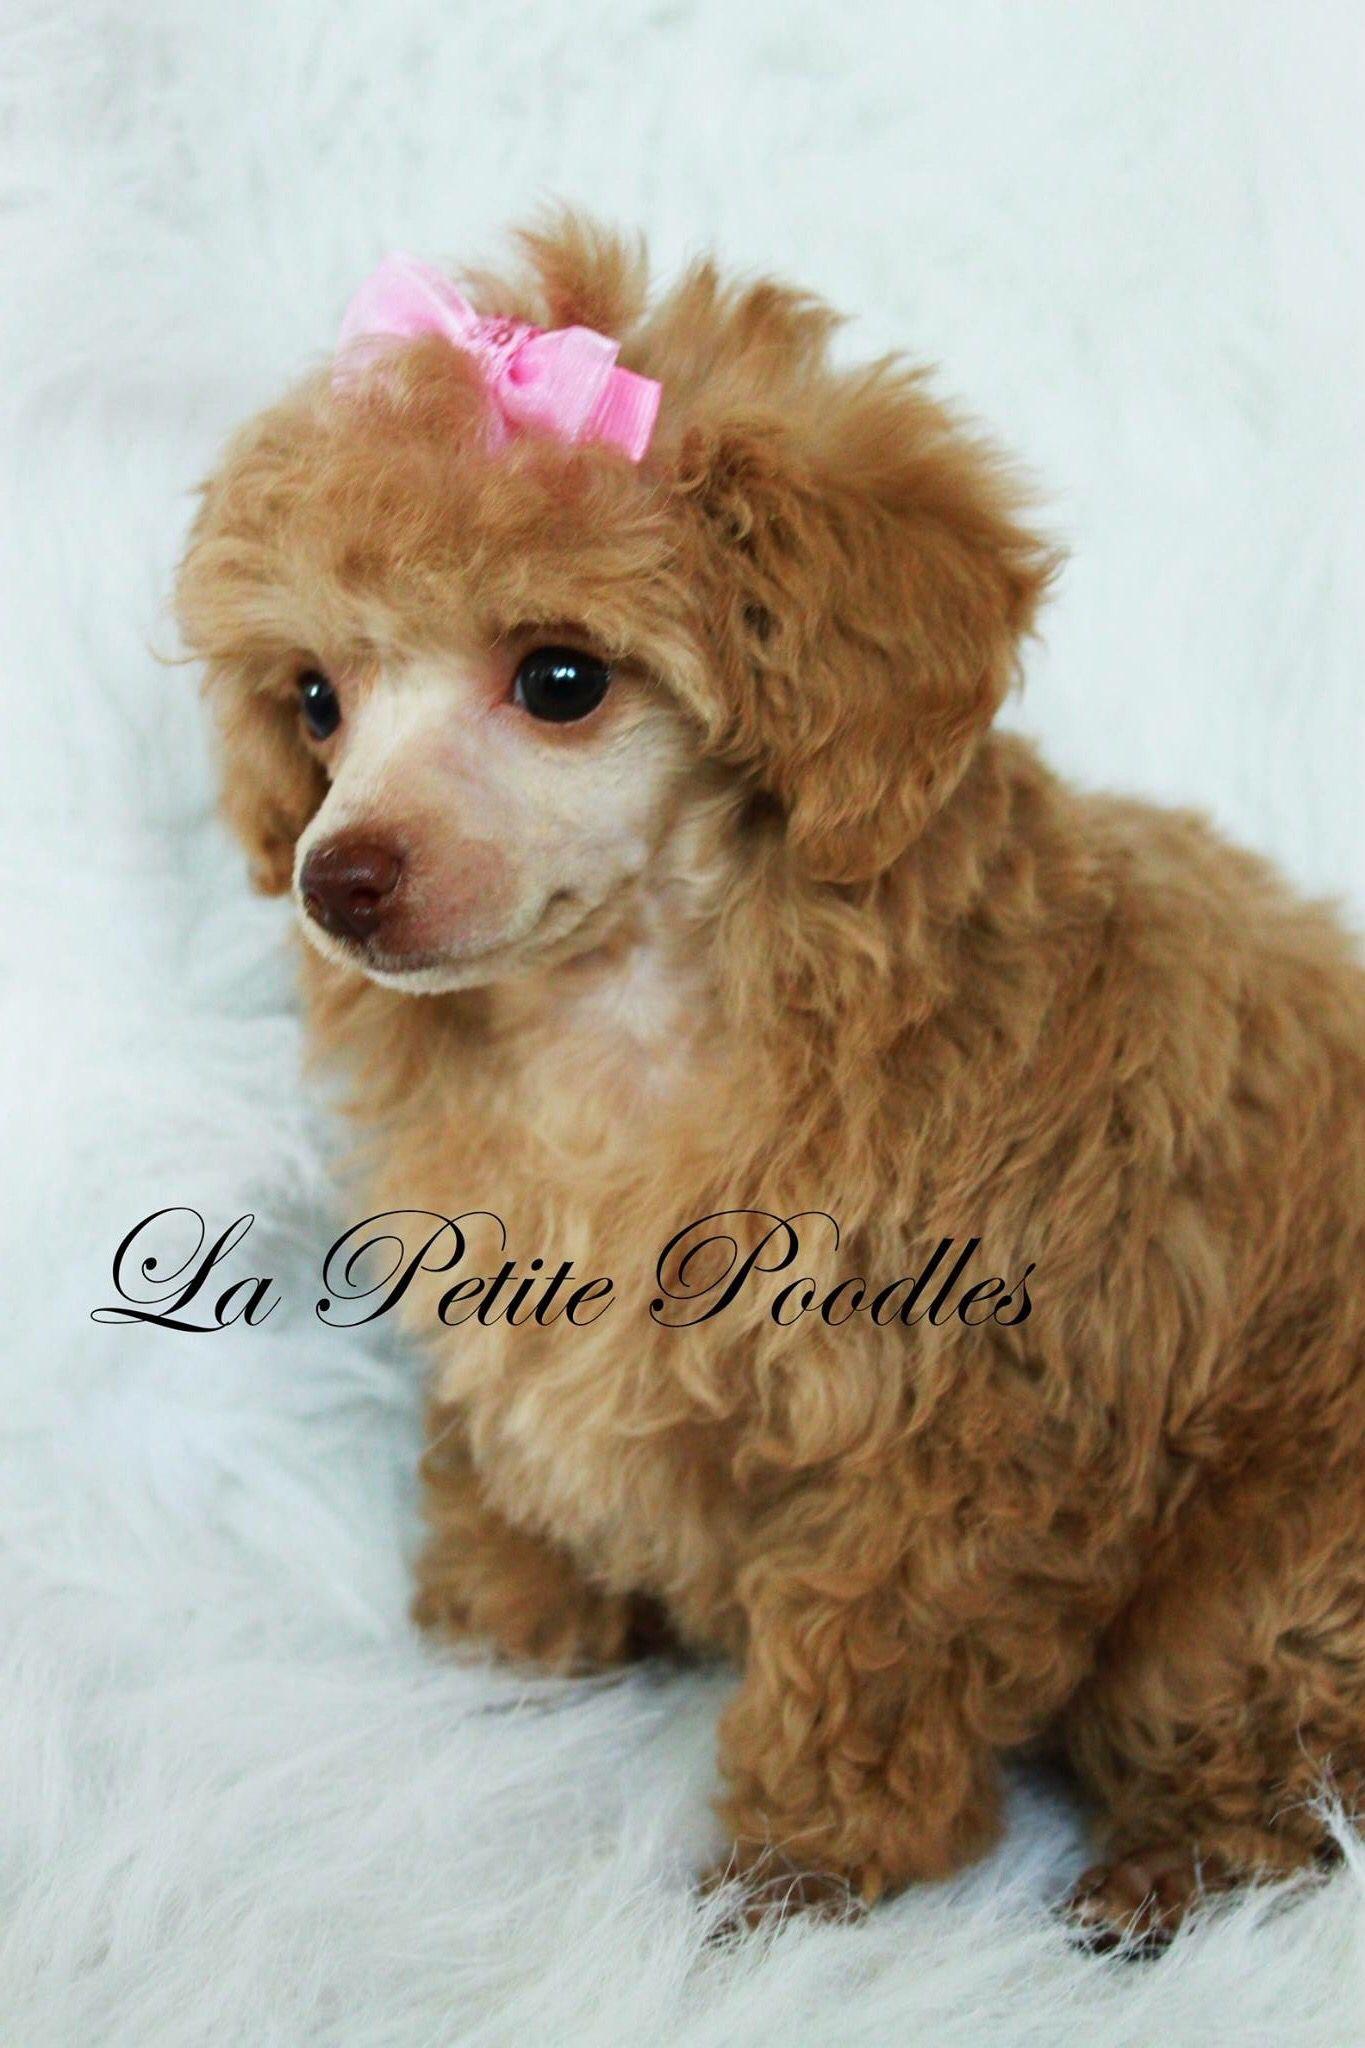 Apricot Tiny Toy Poodle Www Lapetitepoodles Com Cute Animals